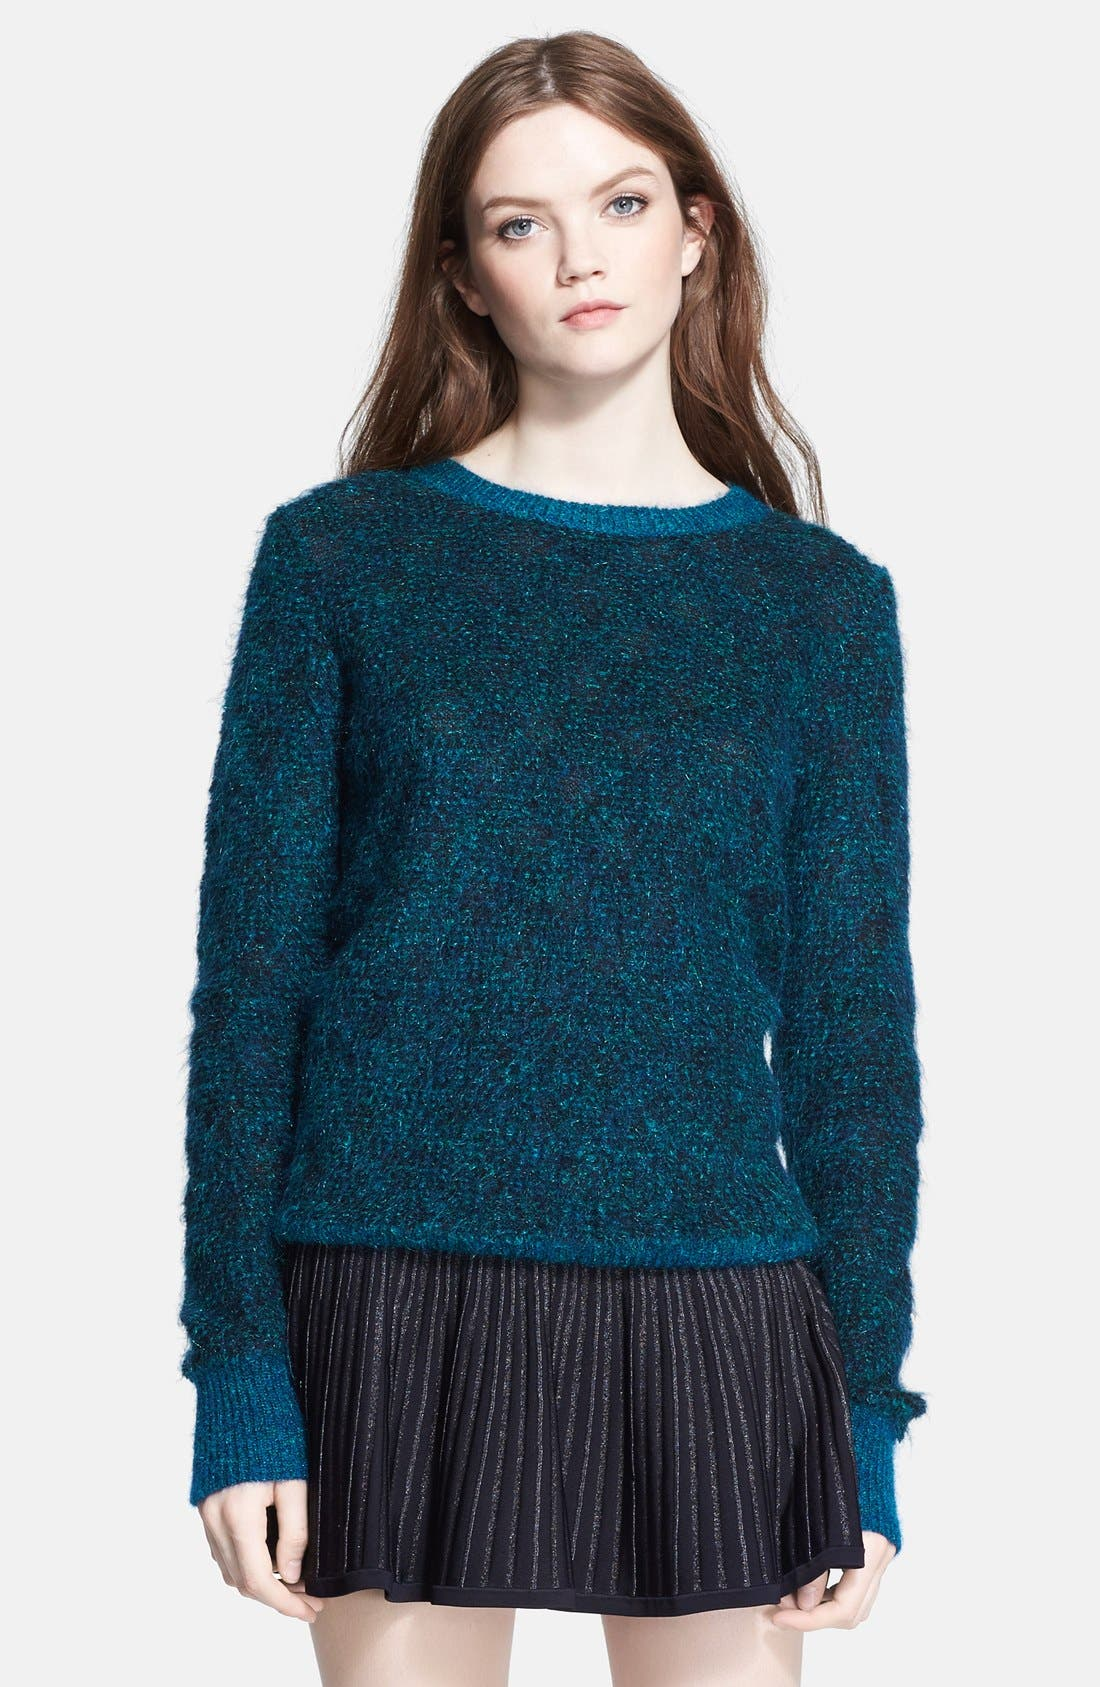 Alternate Image 1 Selected - A.L.C. 'Adina' Metallic Mohair Sweater